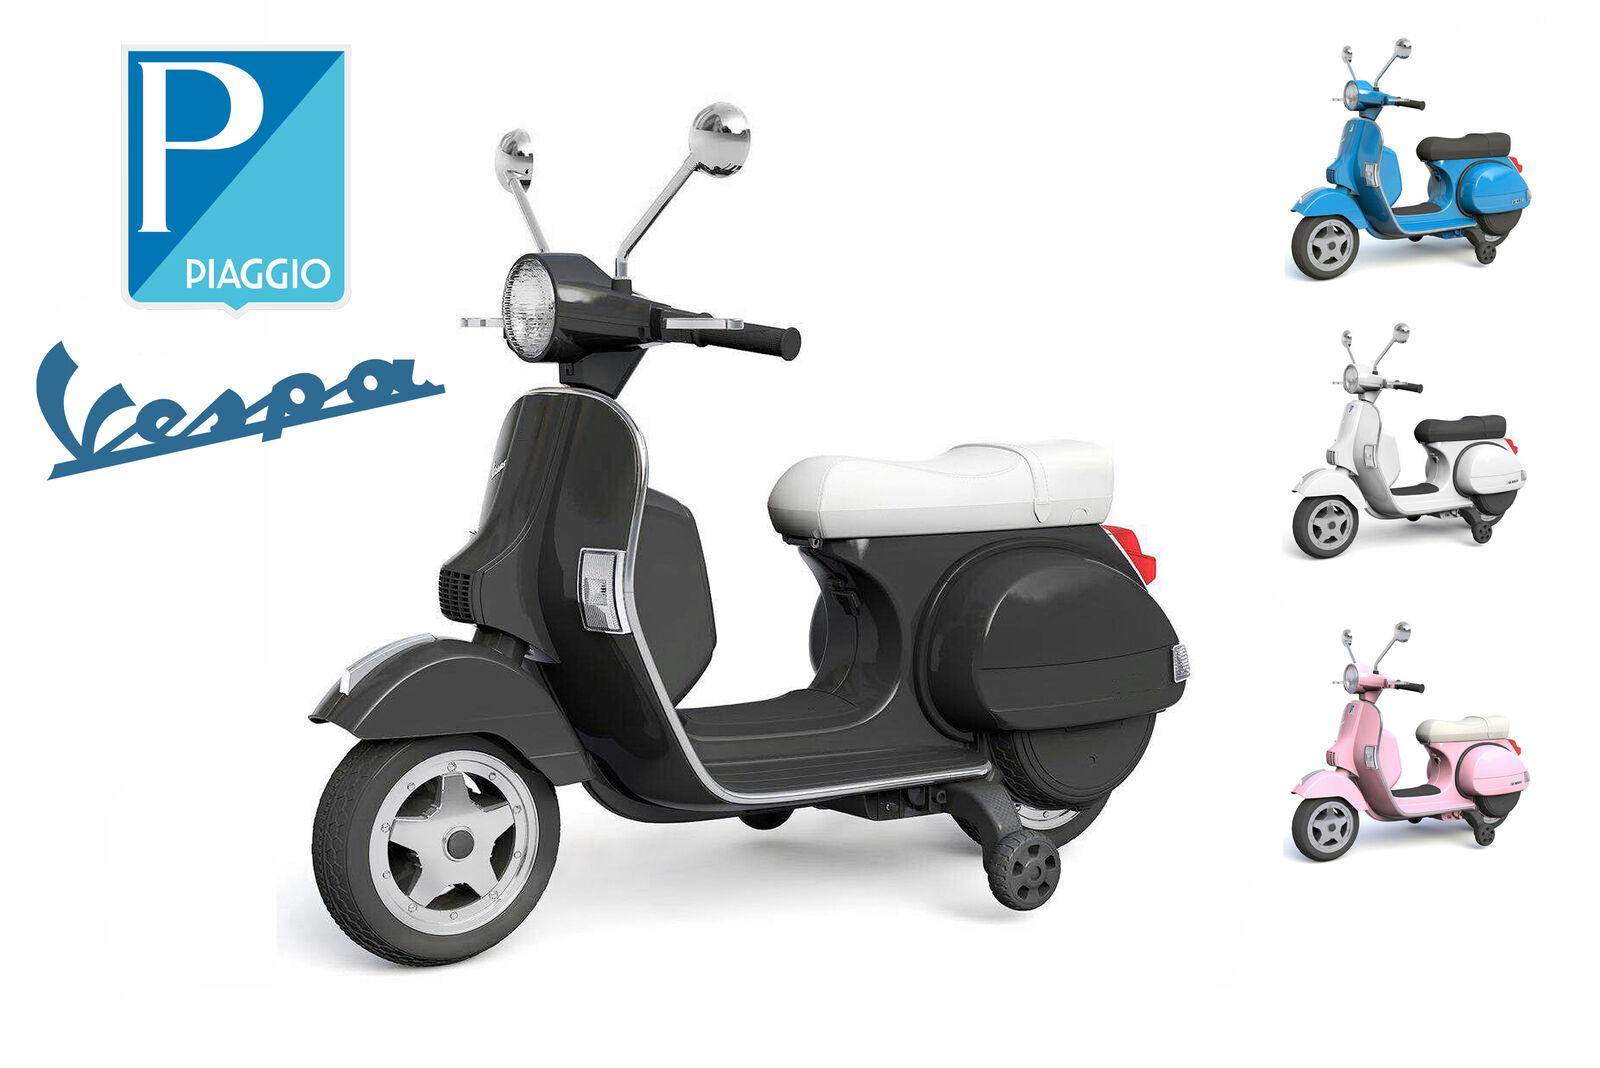 Piaggio Vespa Roller Scooter Kinder Motorrad mit Stützräder Elektro Auto 2x 20W